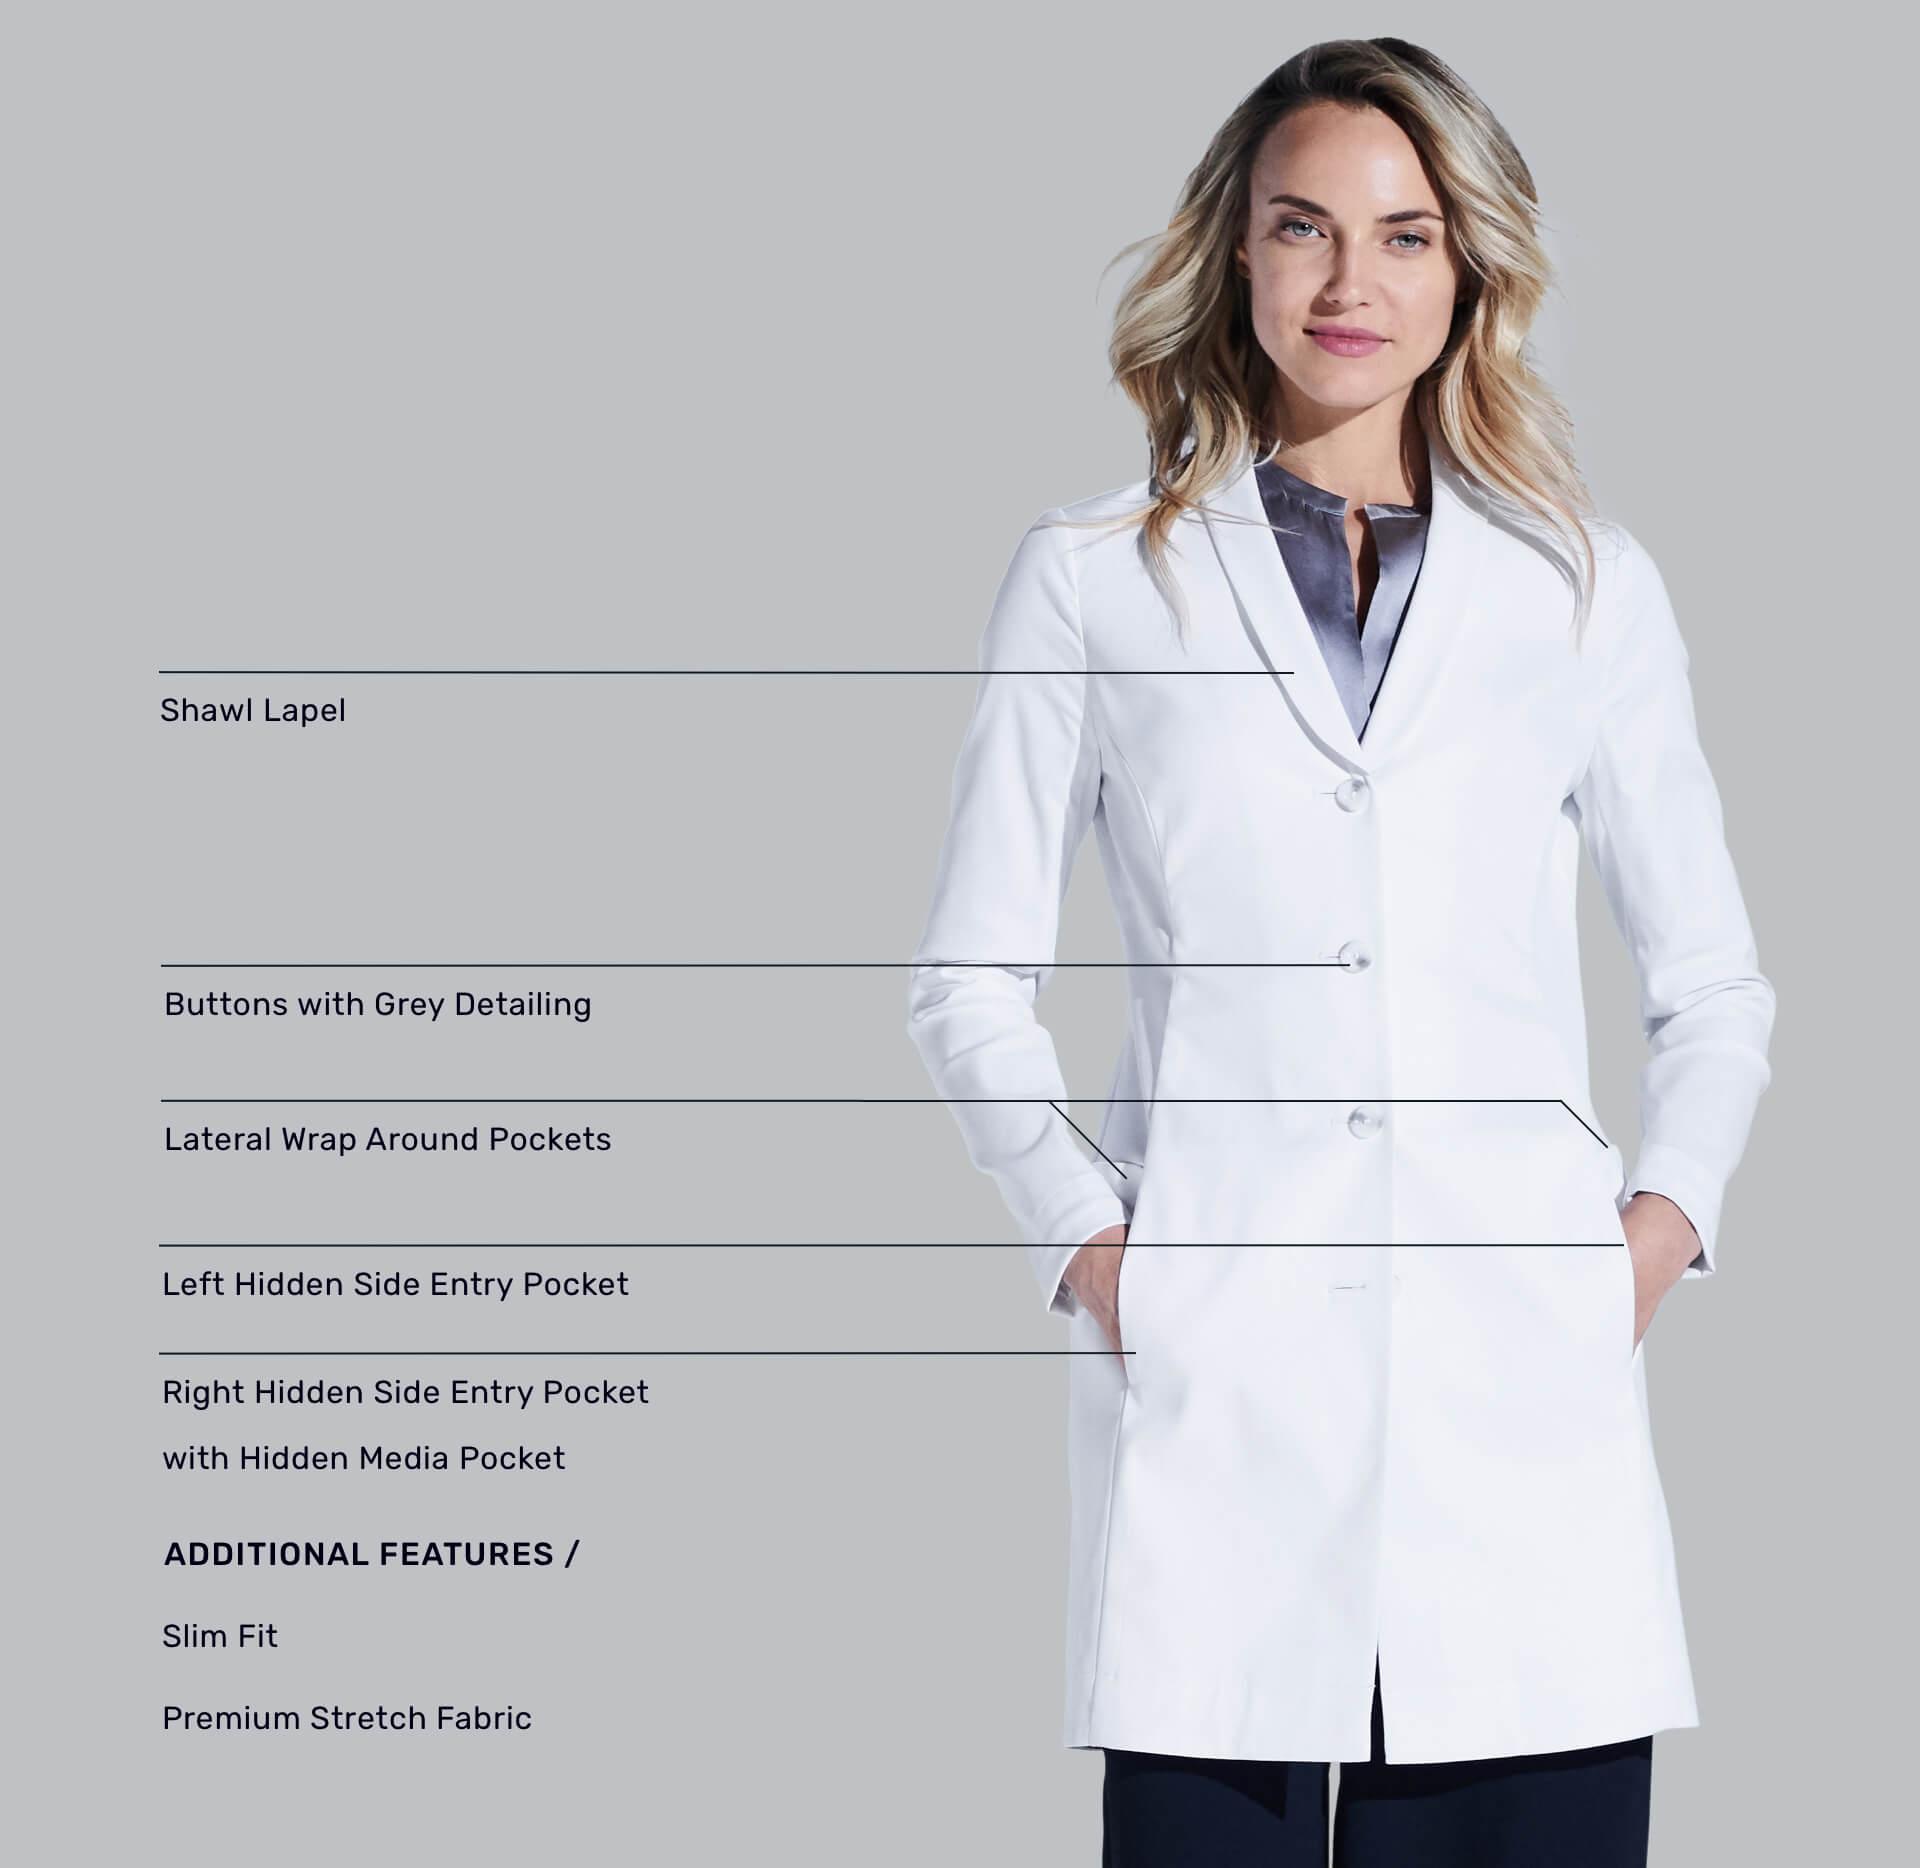 Merit P. Anatomy